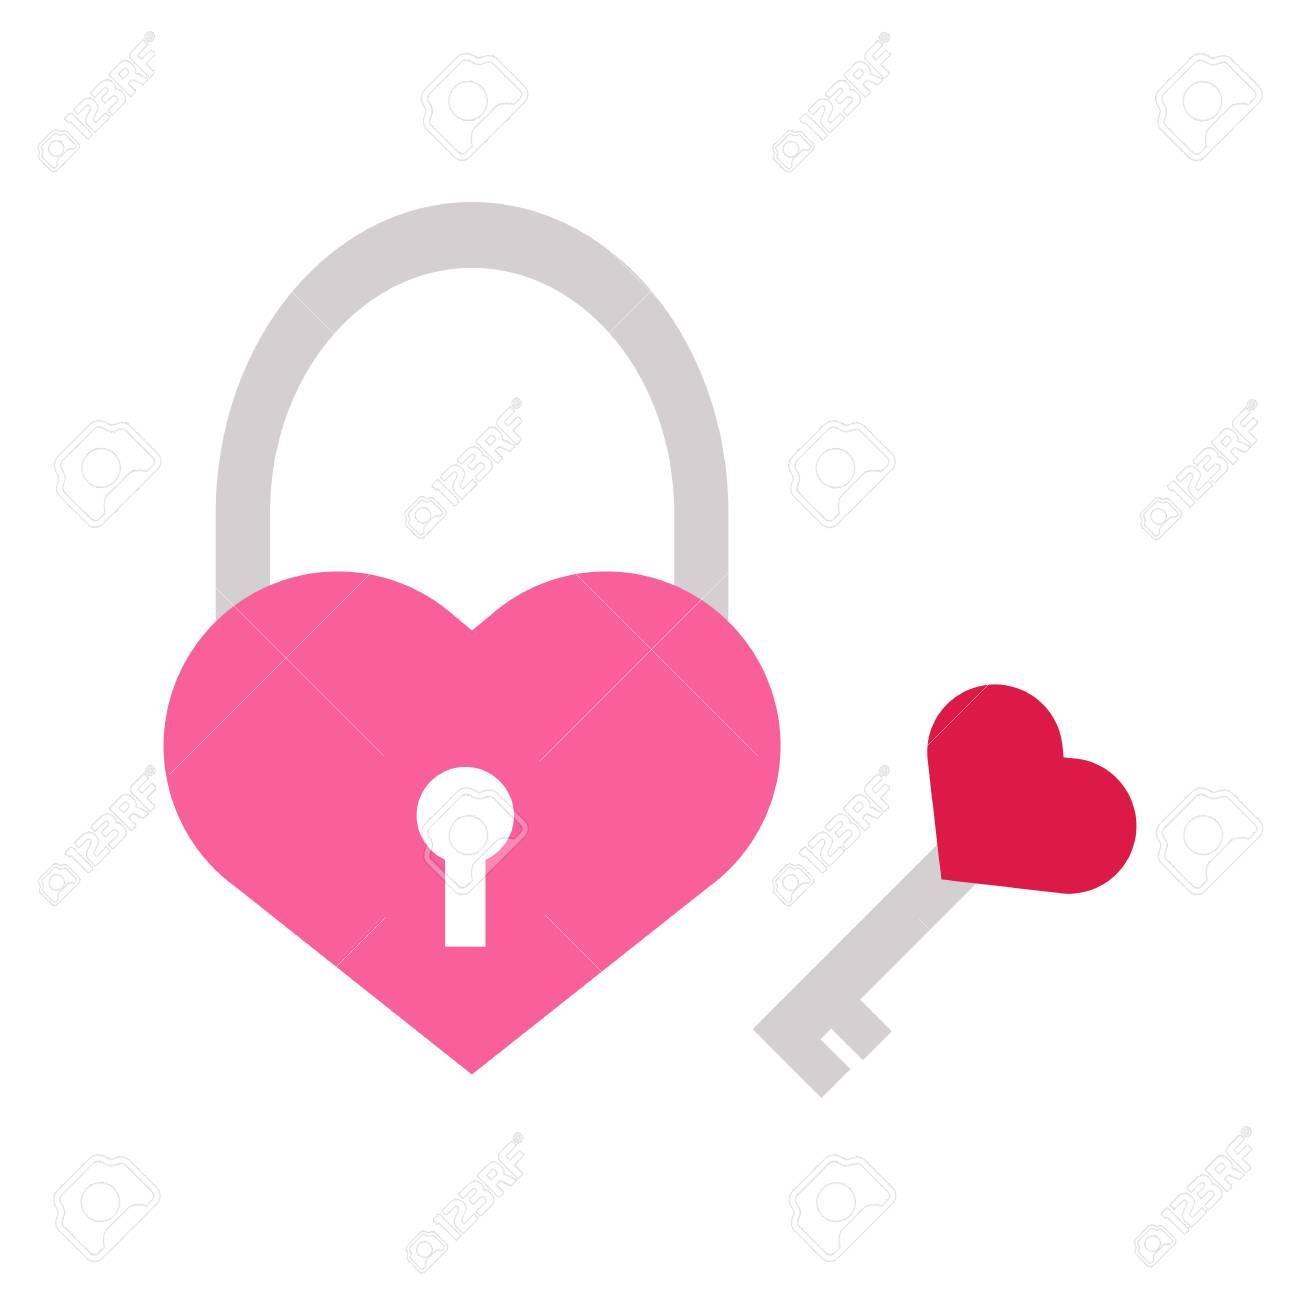 Key Love Heart Padlock Vector Illustration Graphic Design